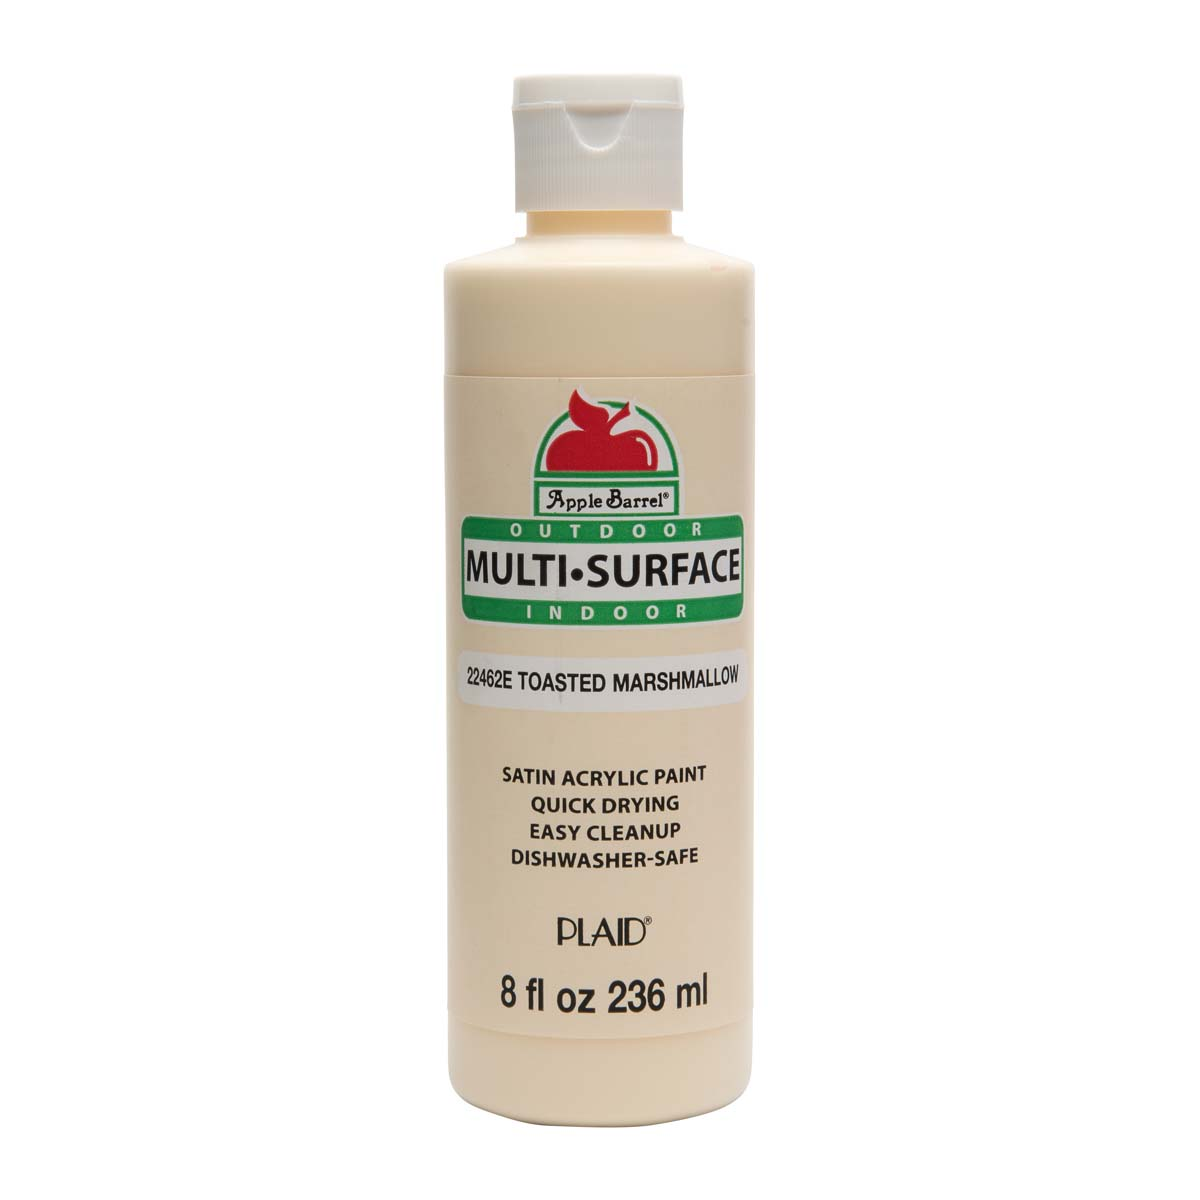 Apple Barrel ® Multi-Surface Satin Acrylic Paints - Toasted Marshmallow, 8 oz.